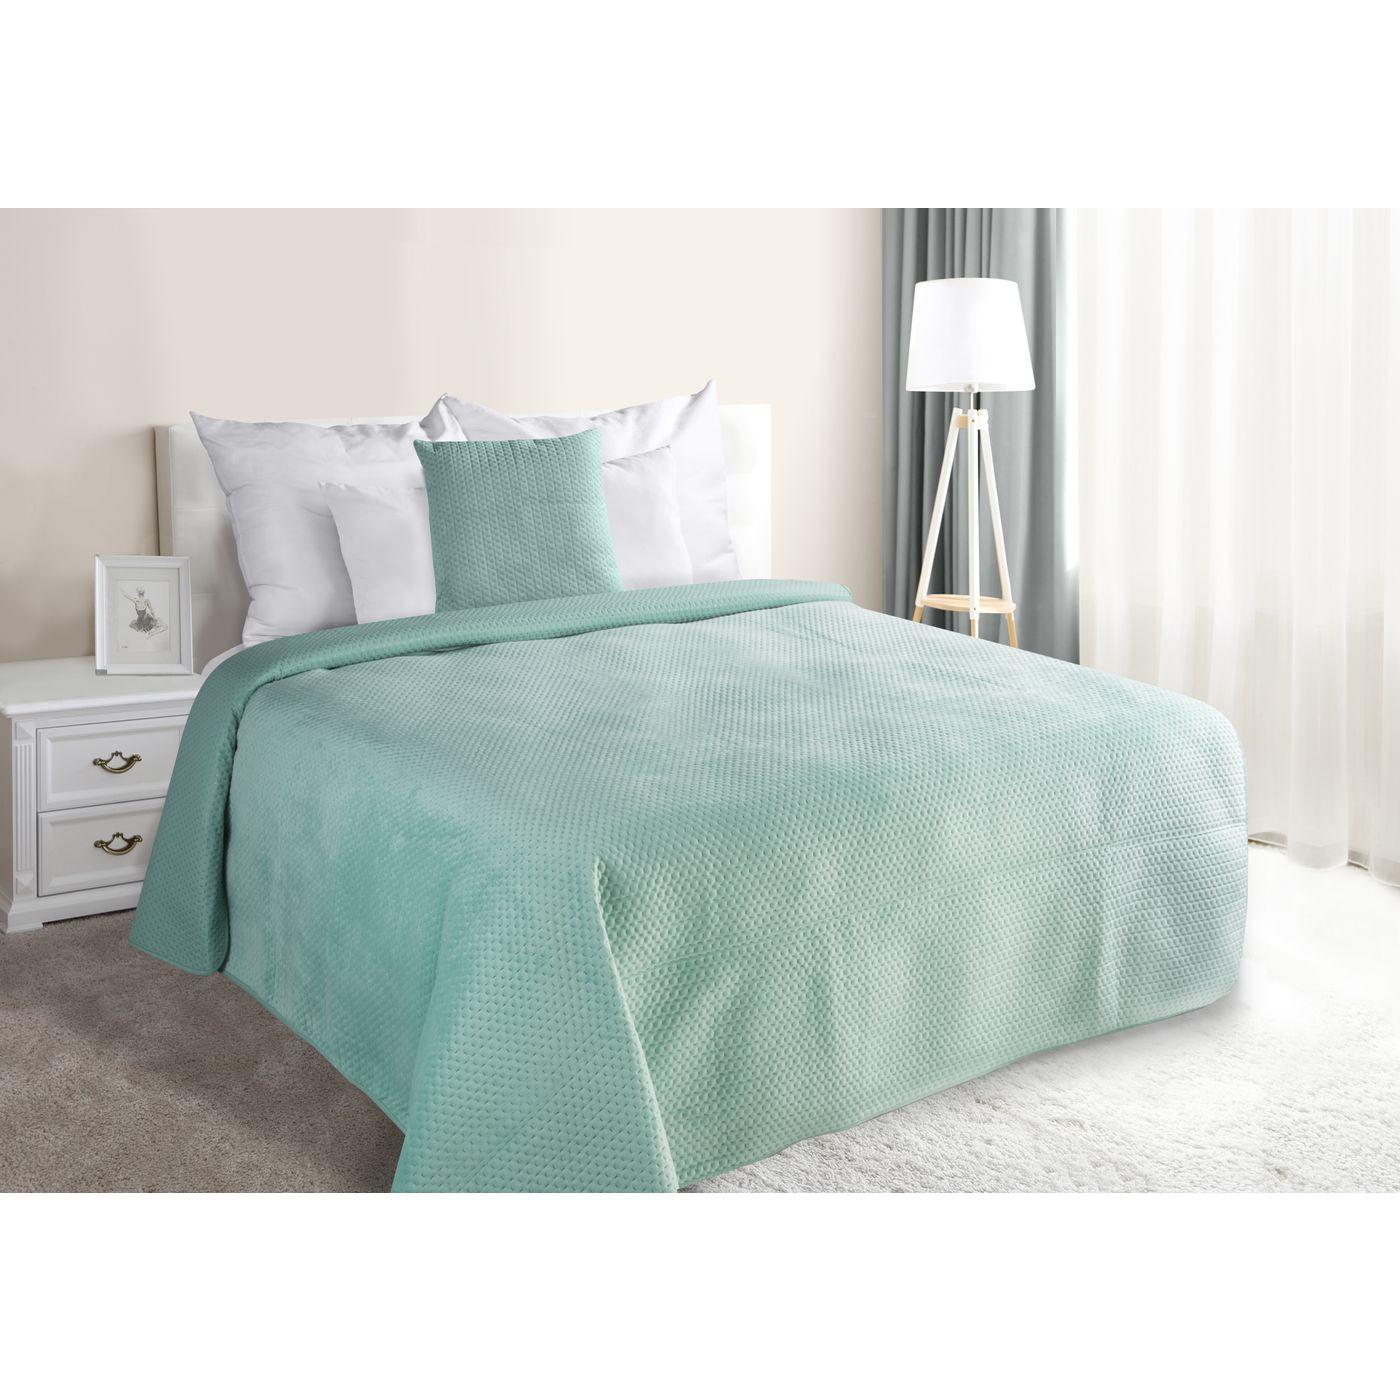 Narzuta na łóżko welwetowa pikowana hotpress 170x210 cm miętowa